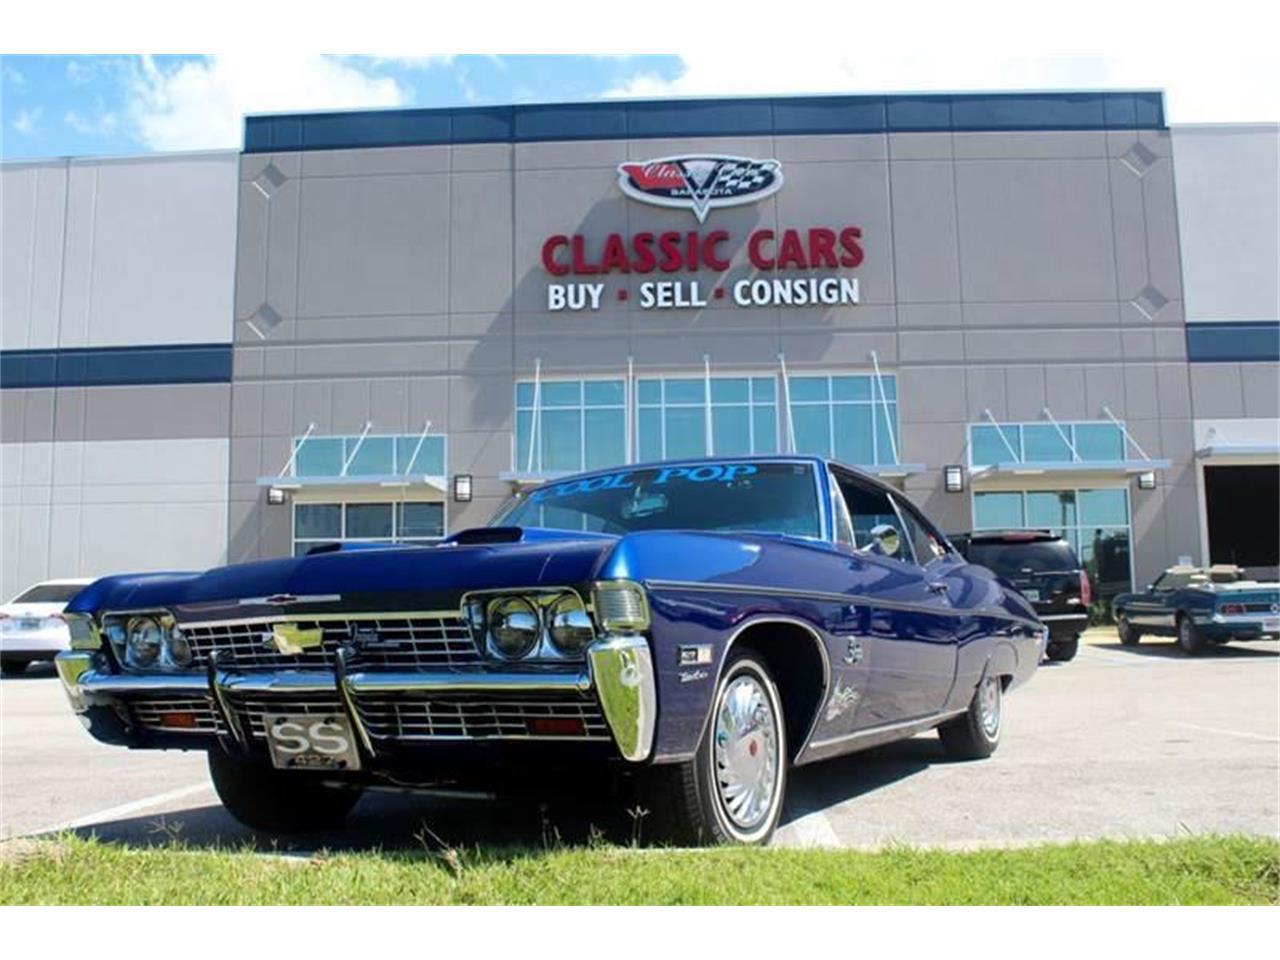 For Sale: 1968 Chevrolet Impala in Sarasota, Florida